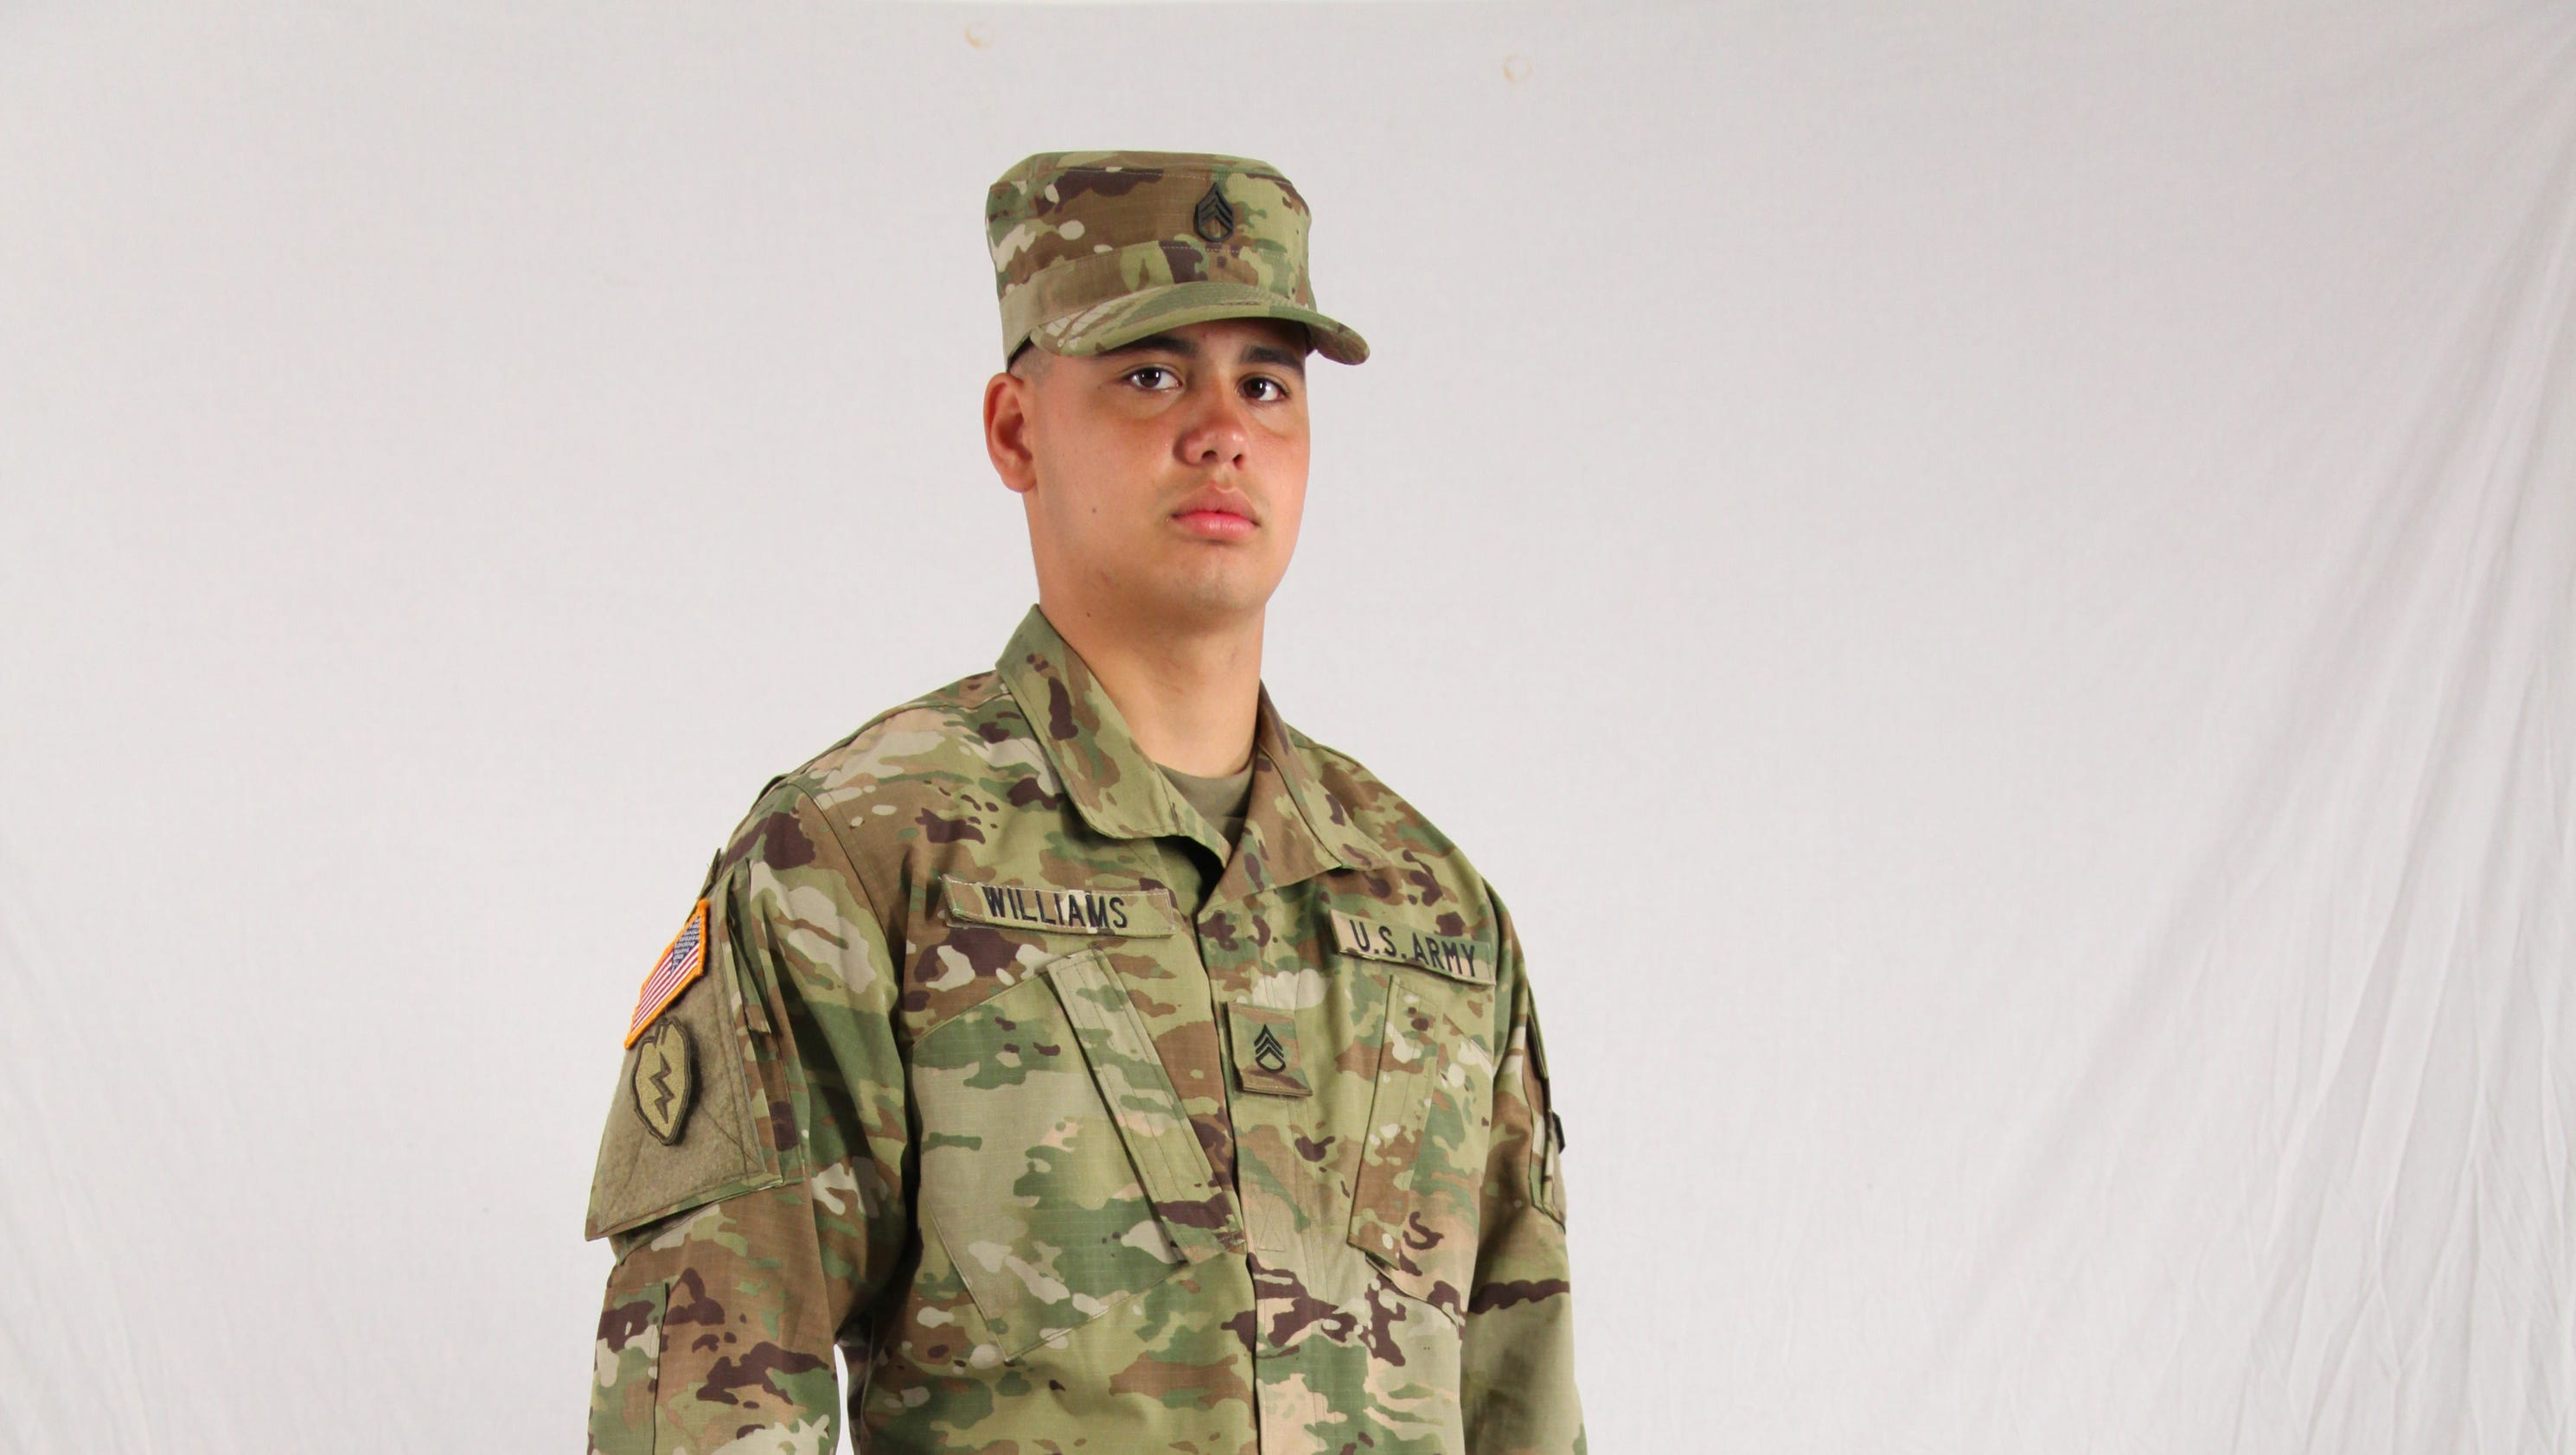 Army Apft Uniform 6